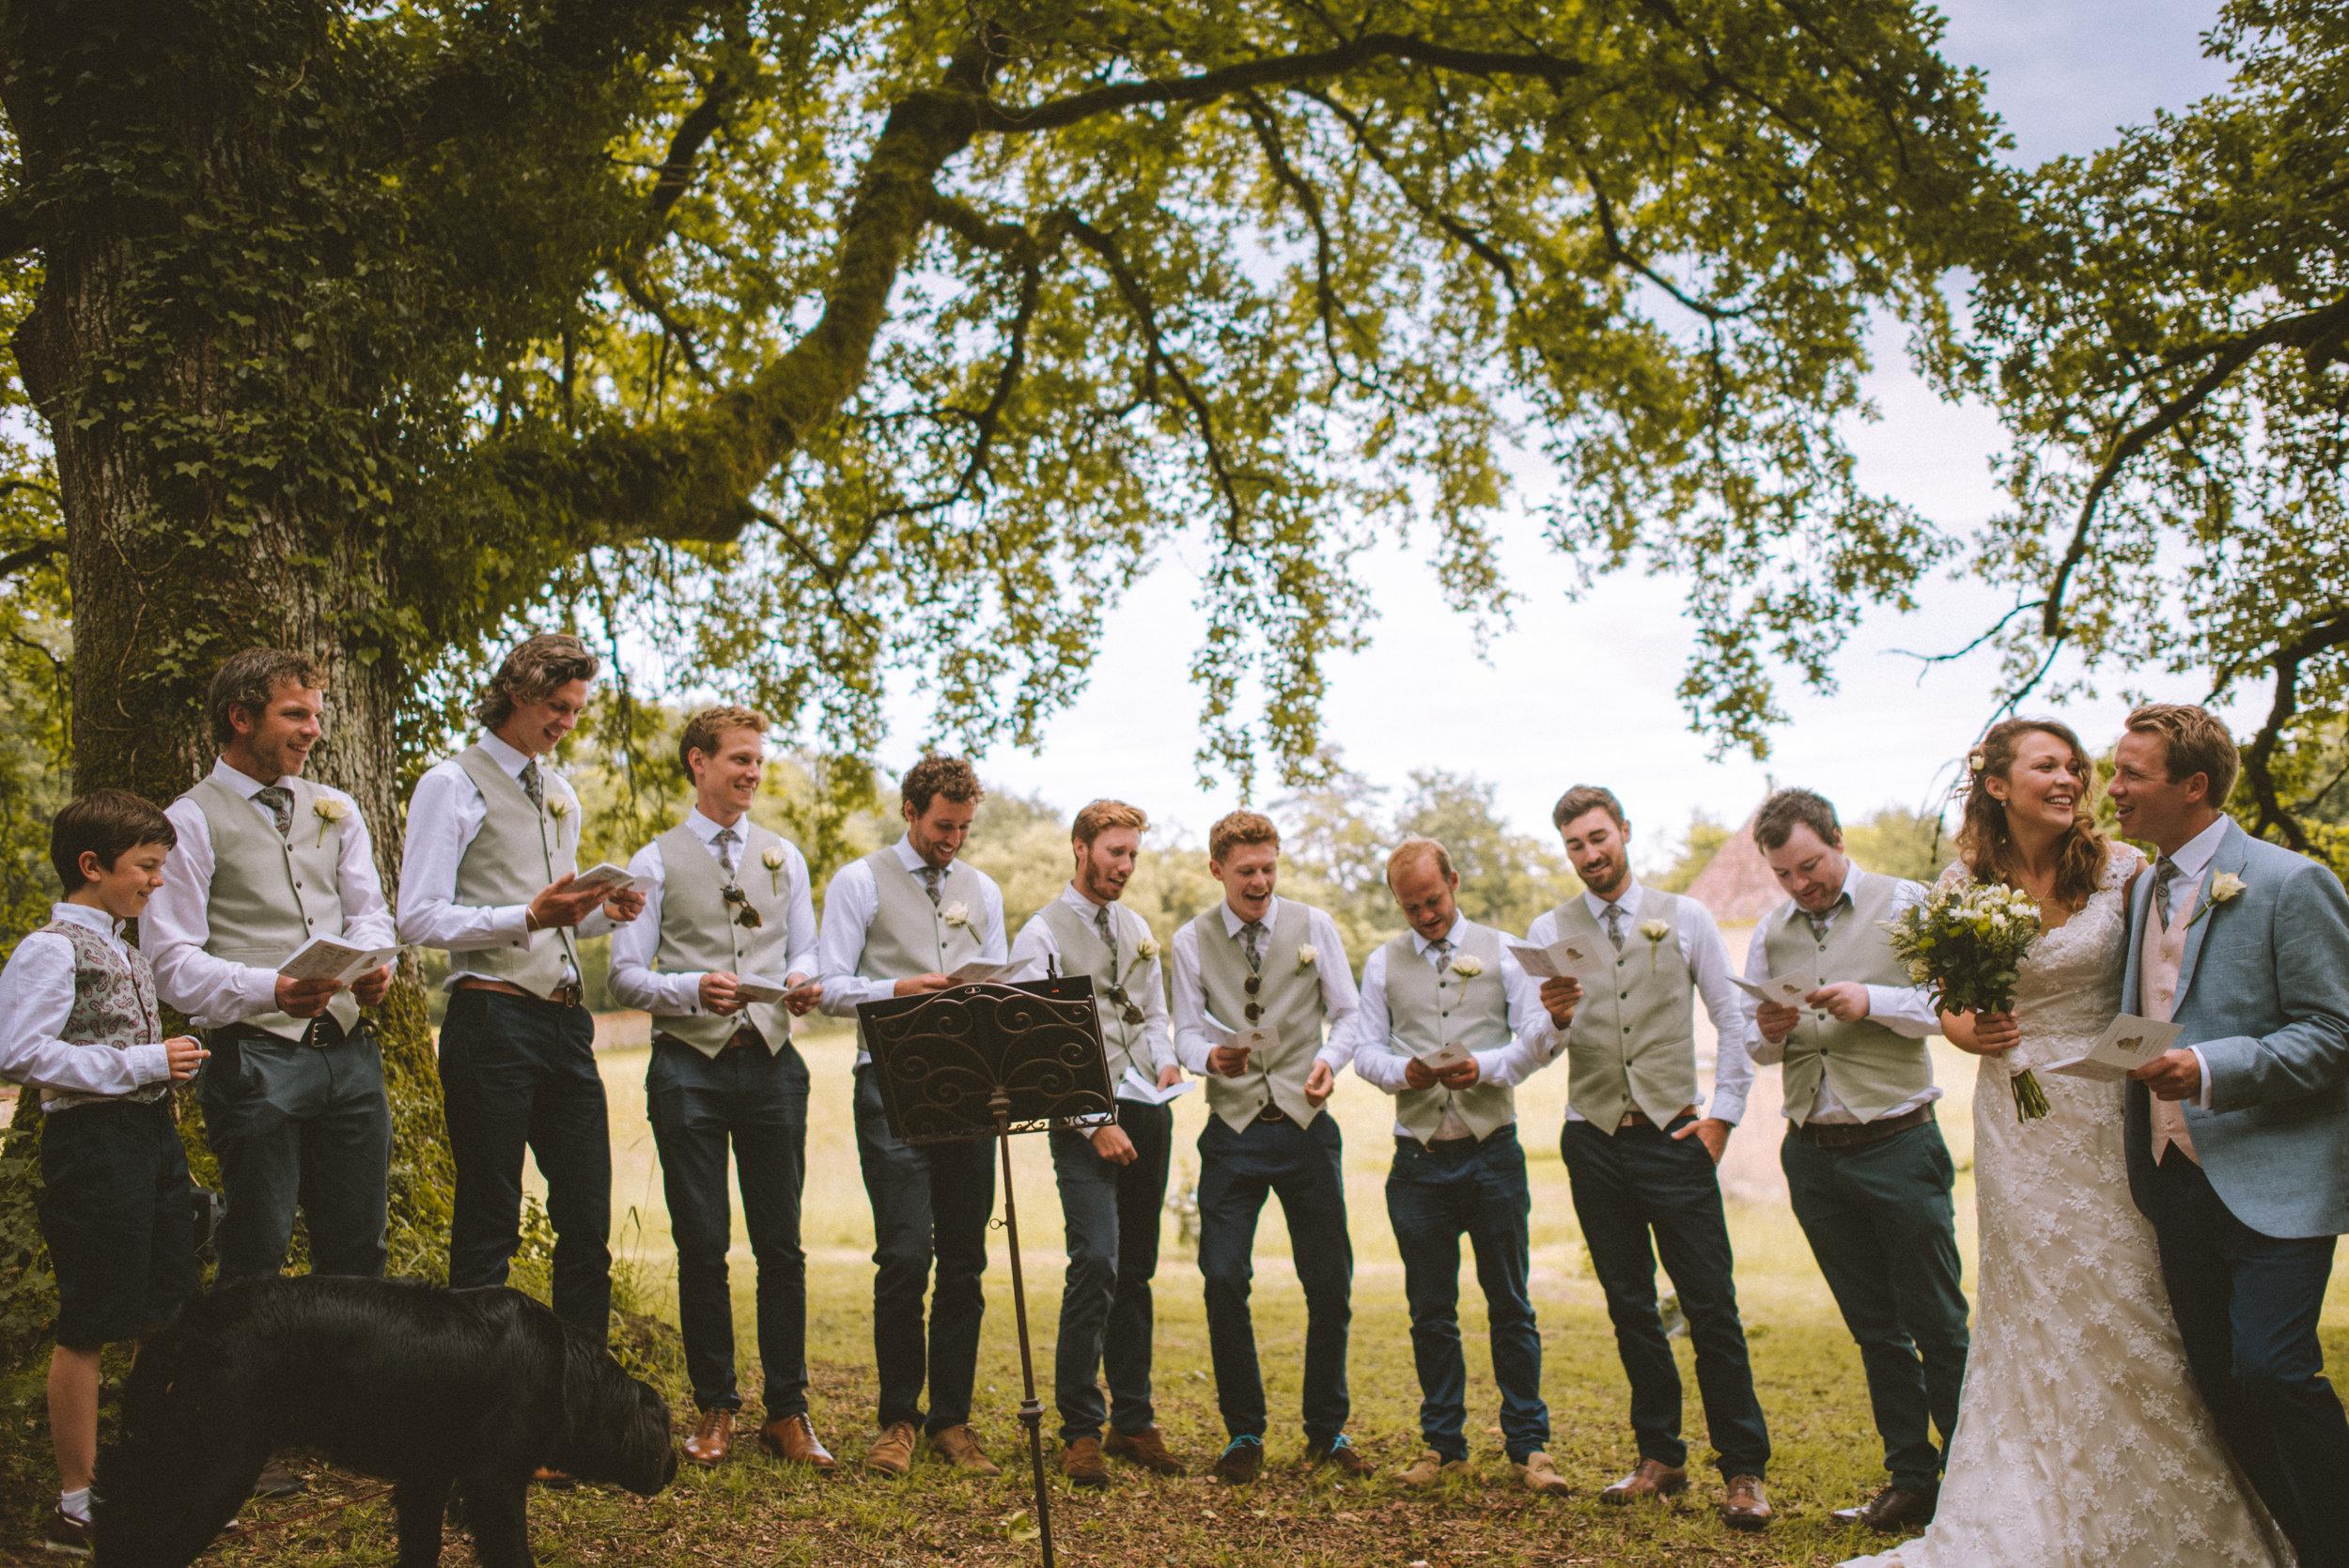 dordogne-wedding-photographer-mark-shaw-23.jpg